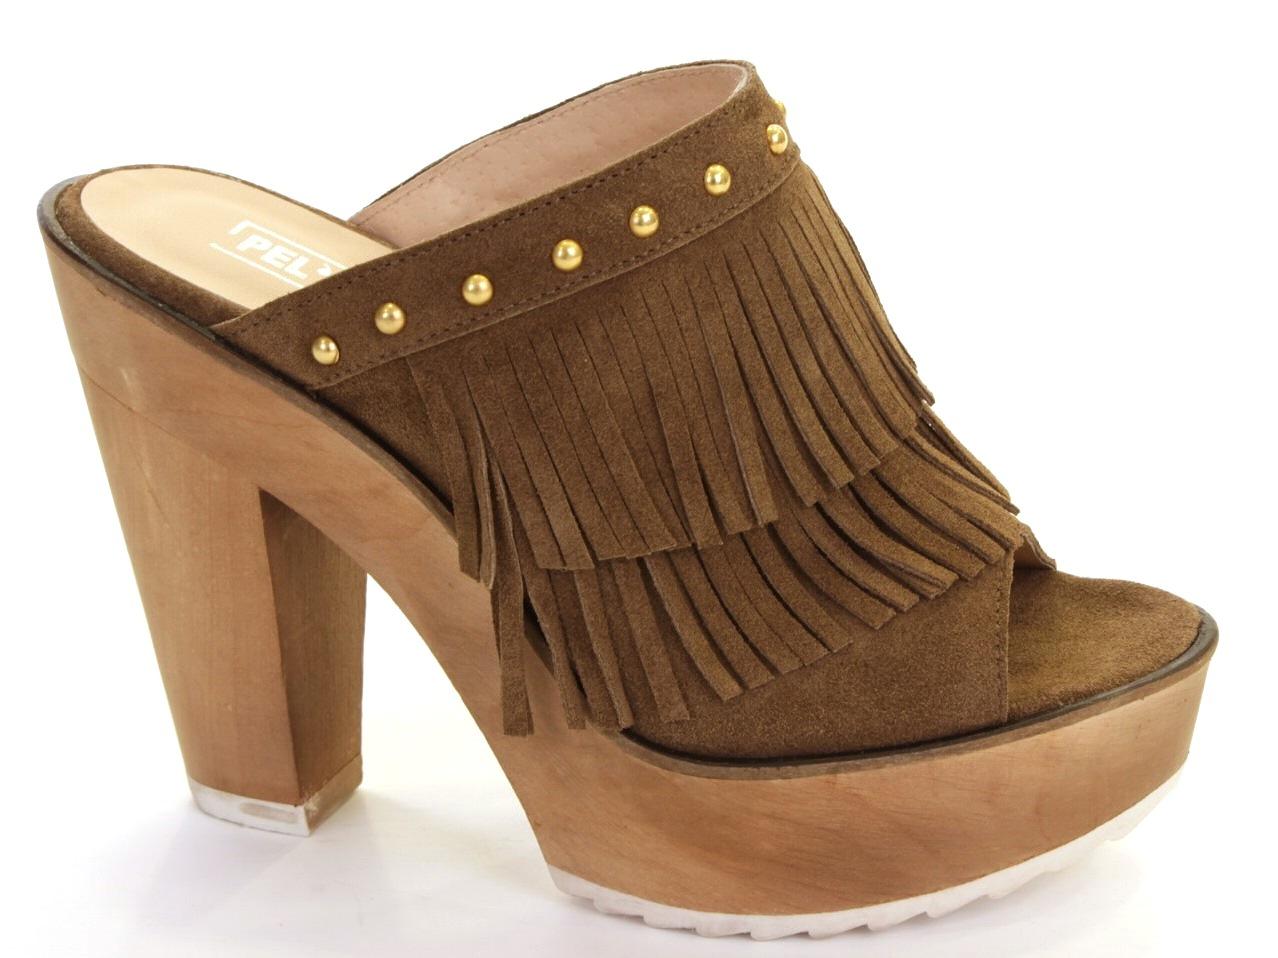 Heel Sandals Sofia Costa - 085 7900